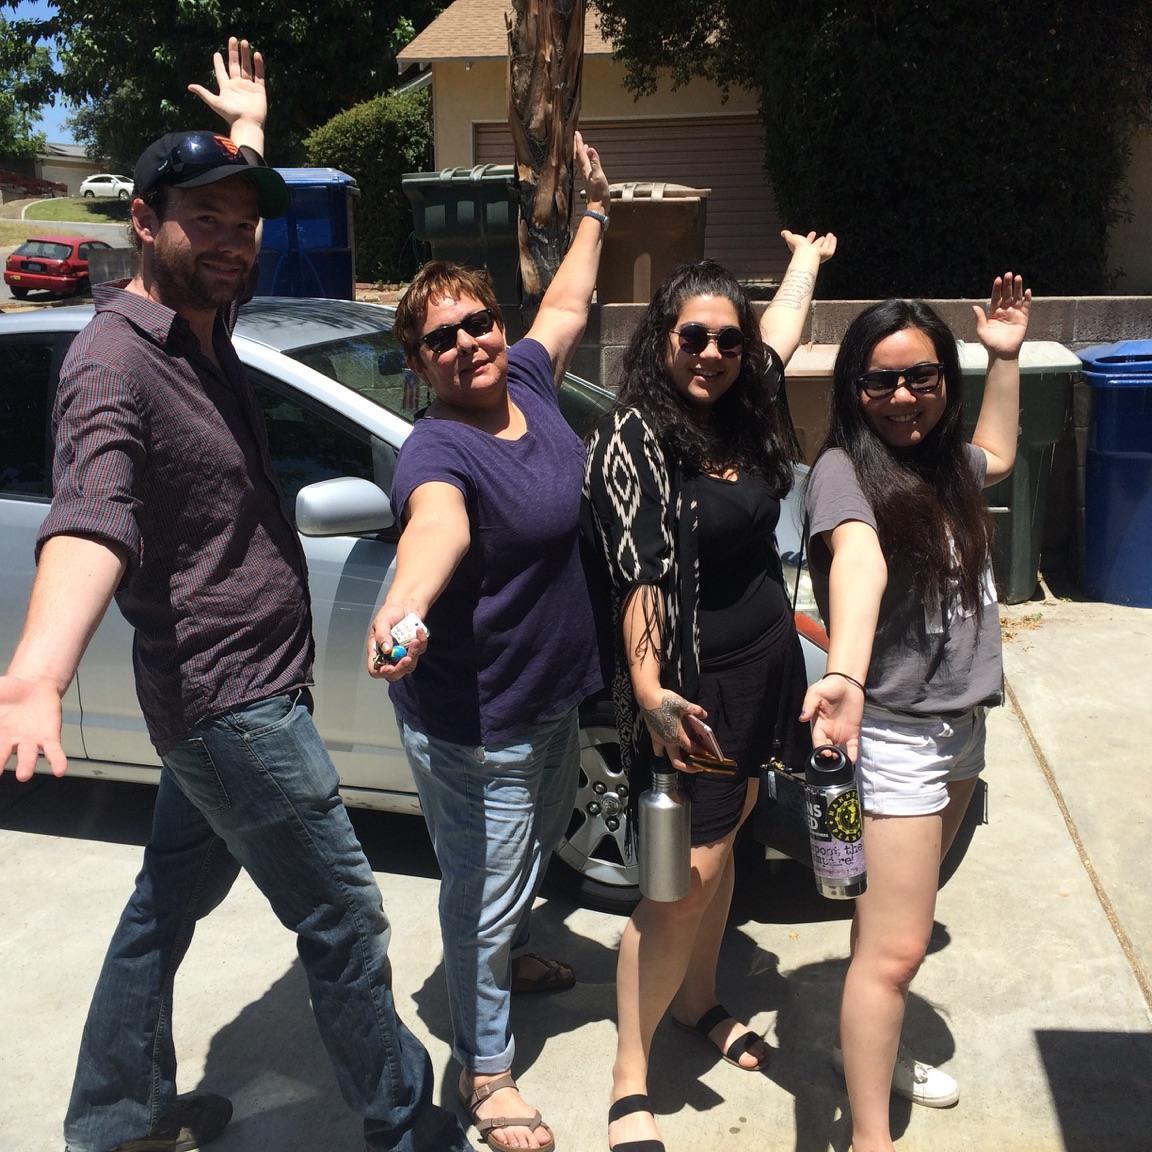 Alex Hartnett, Rosanna Esparza, Shanna Serrano and Zolboo Namkhaidorj in Kern County this weekend